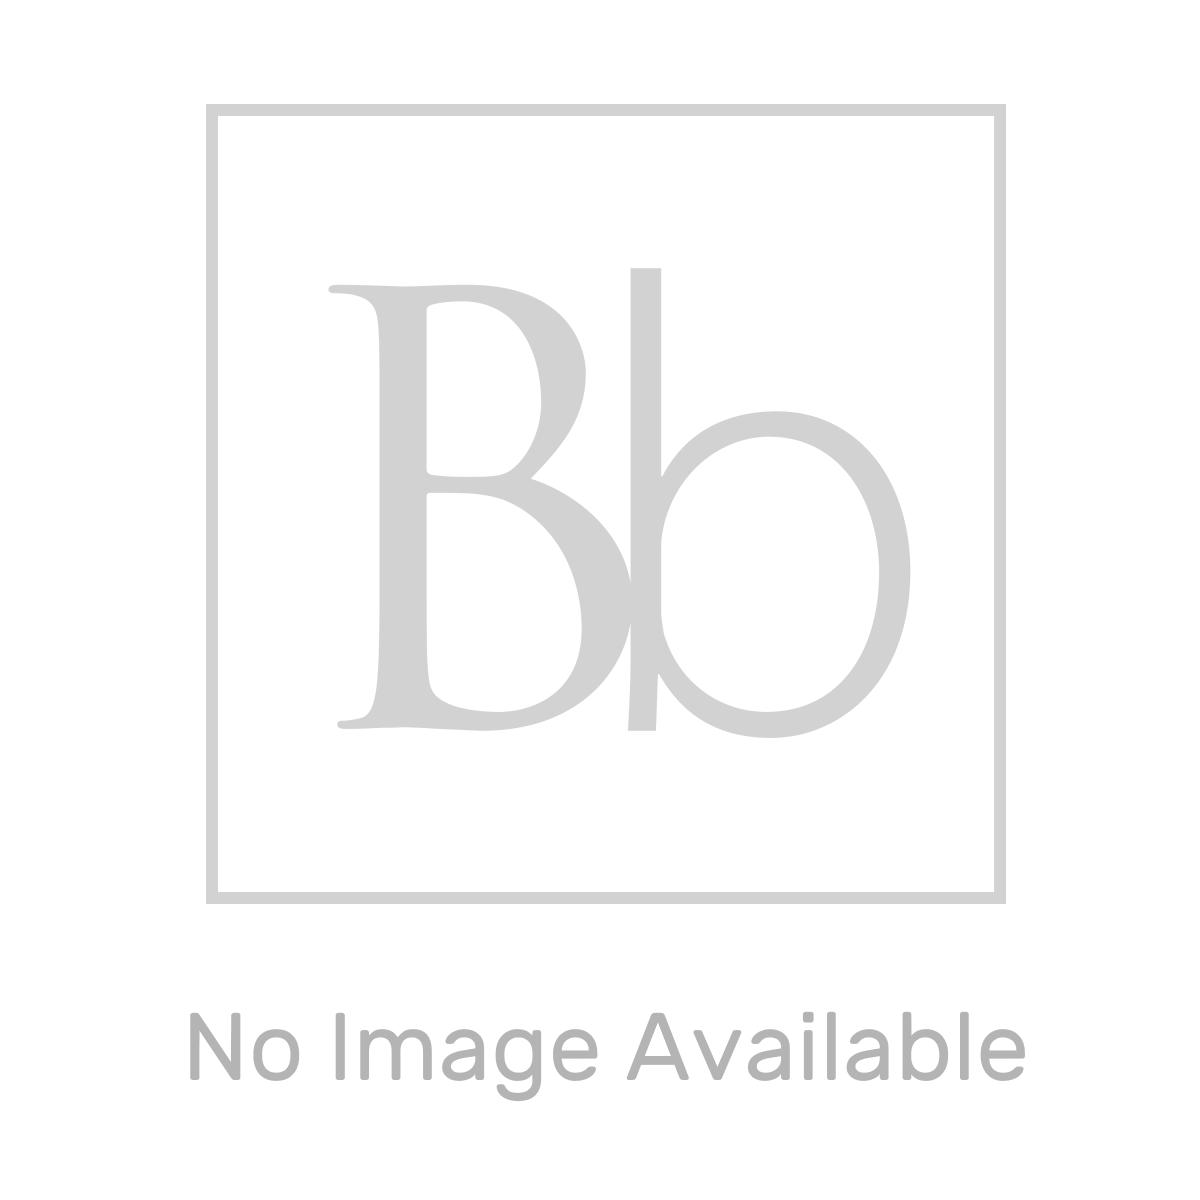 Frontline Aquaglass+ Frameless Sliding Bath Screen